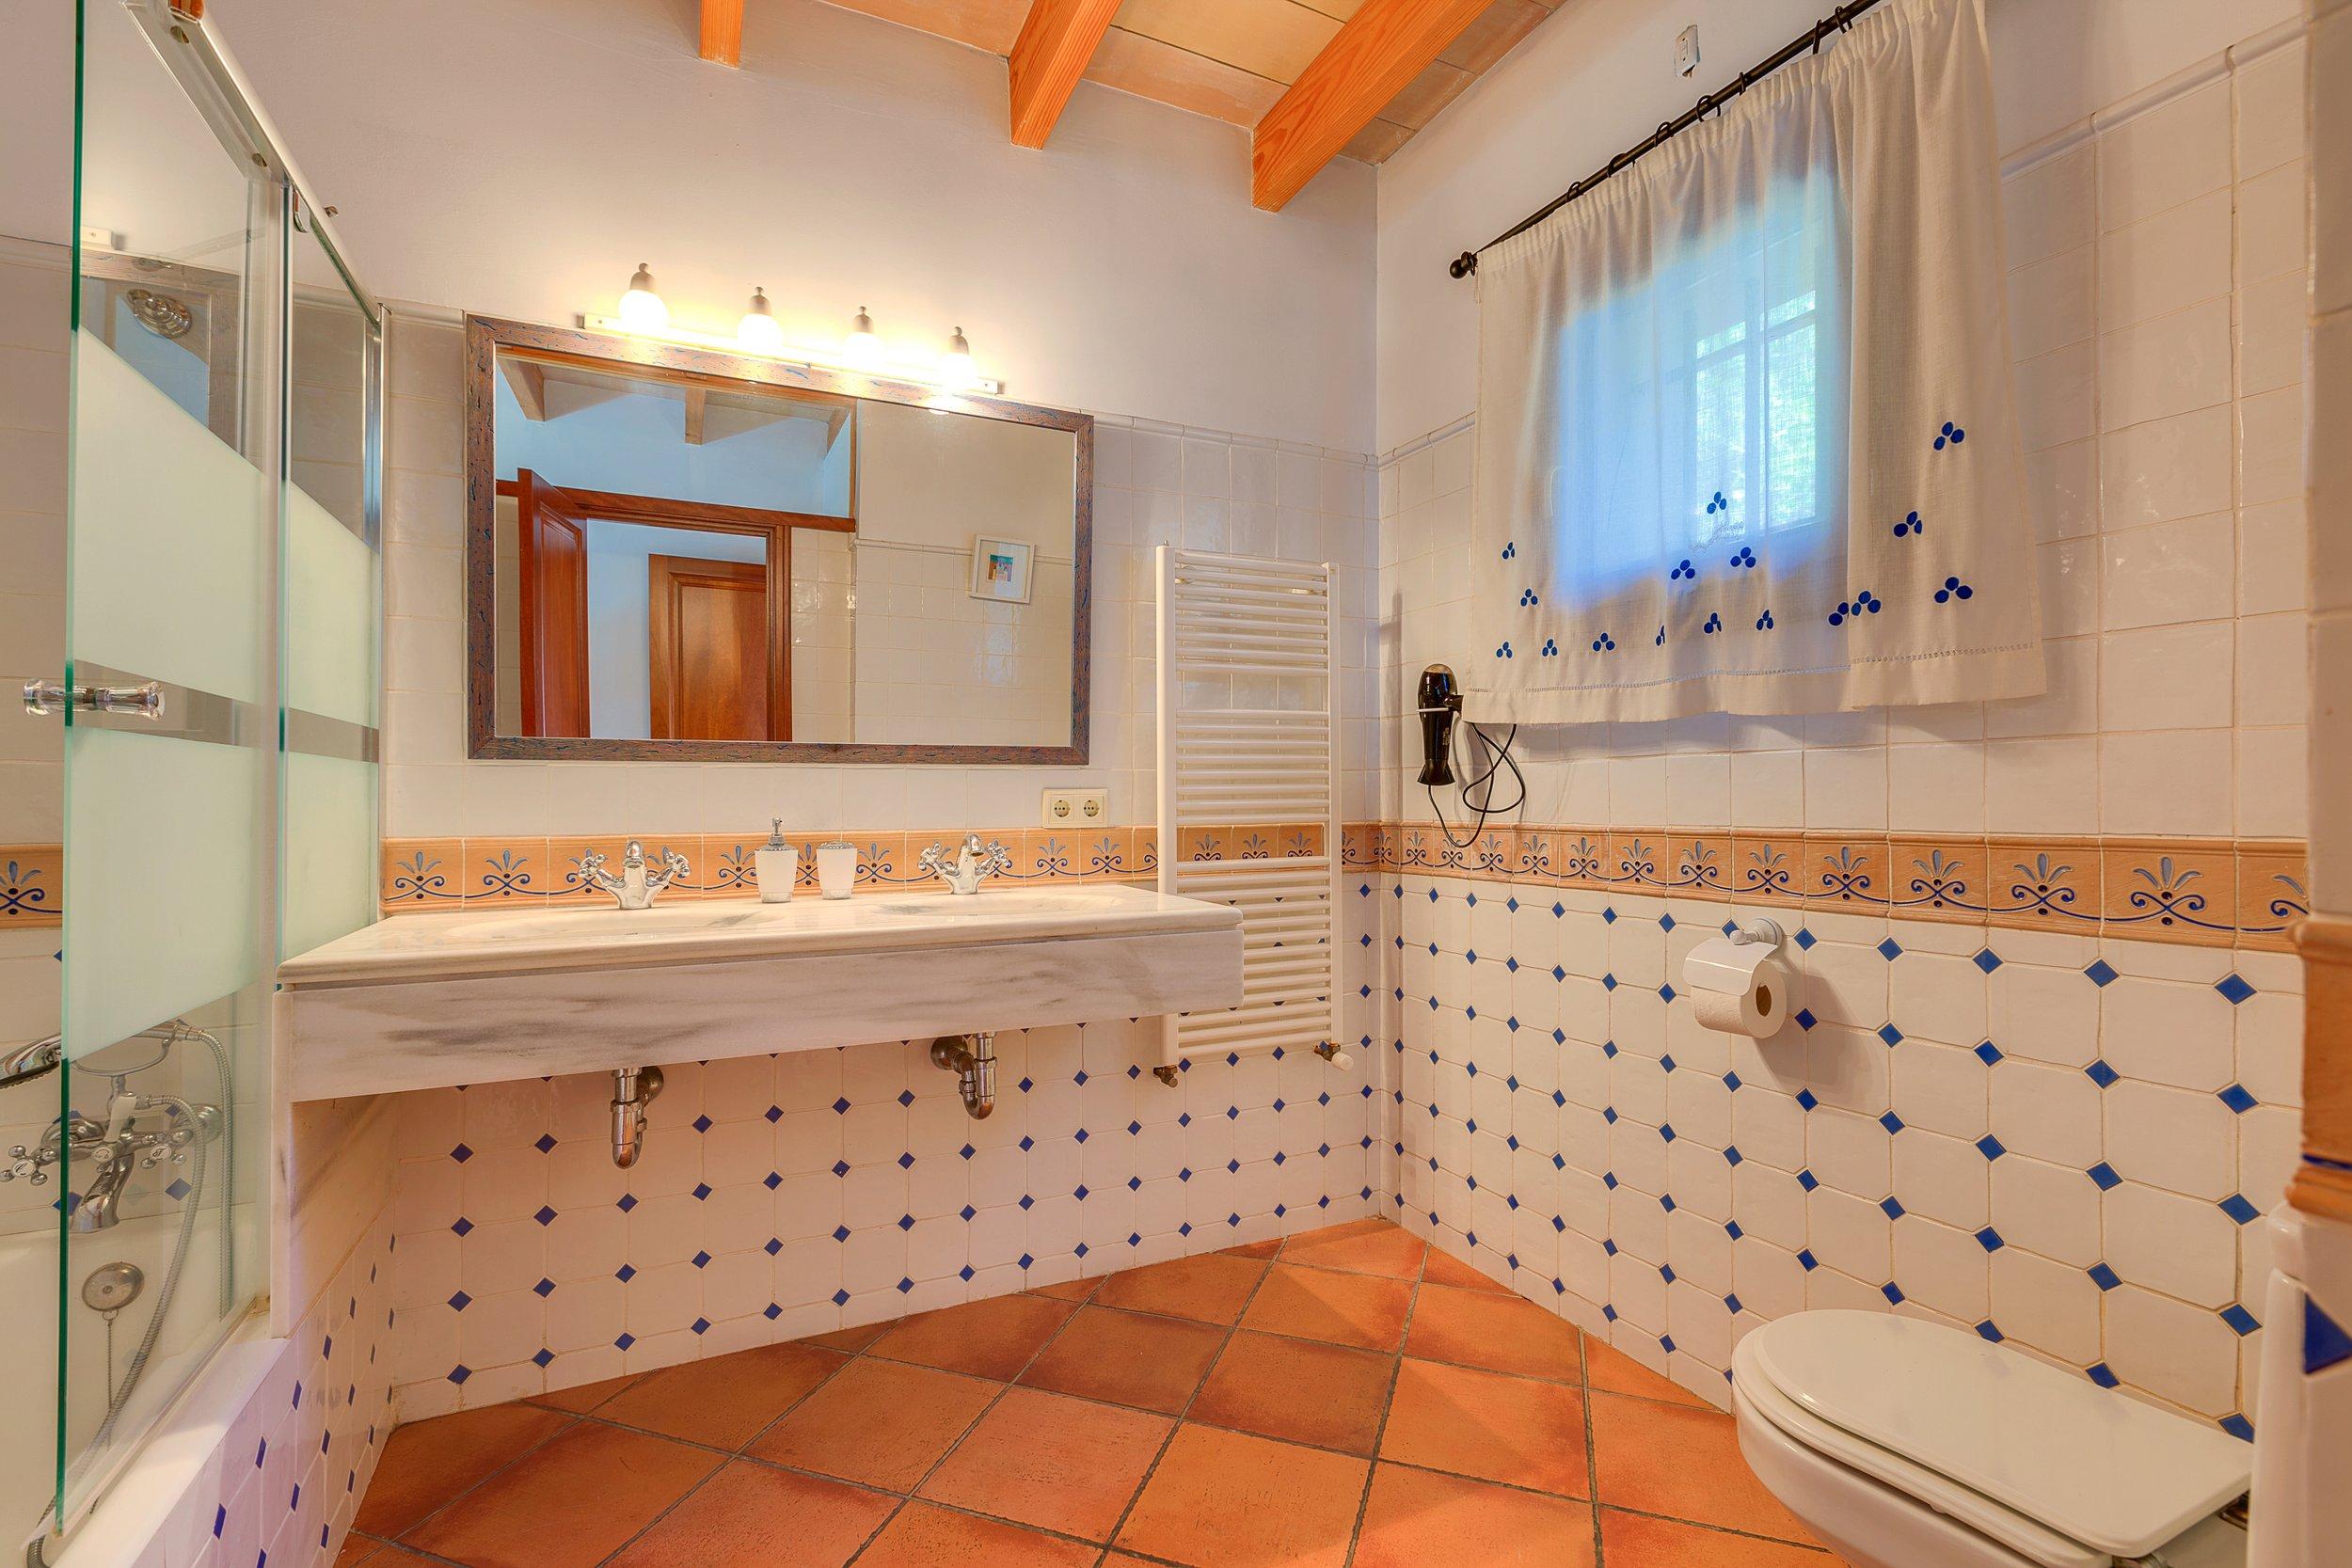 Maison de vacances Villa Cirera in Alaro (2611793), Alaro, Majorque, Iles Baléares, Espagne, image 23